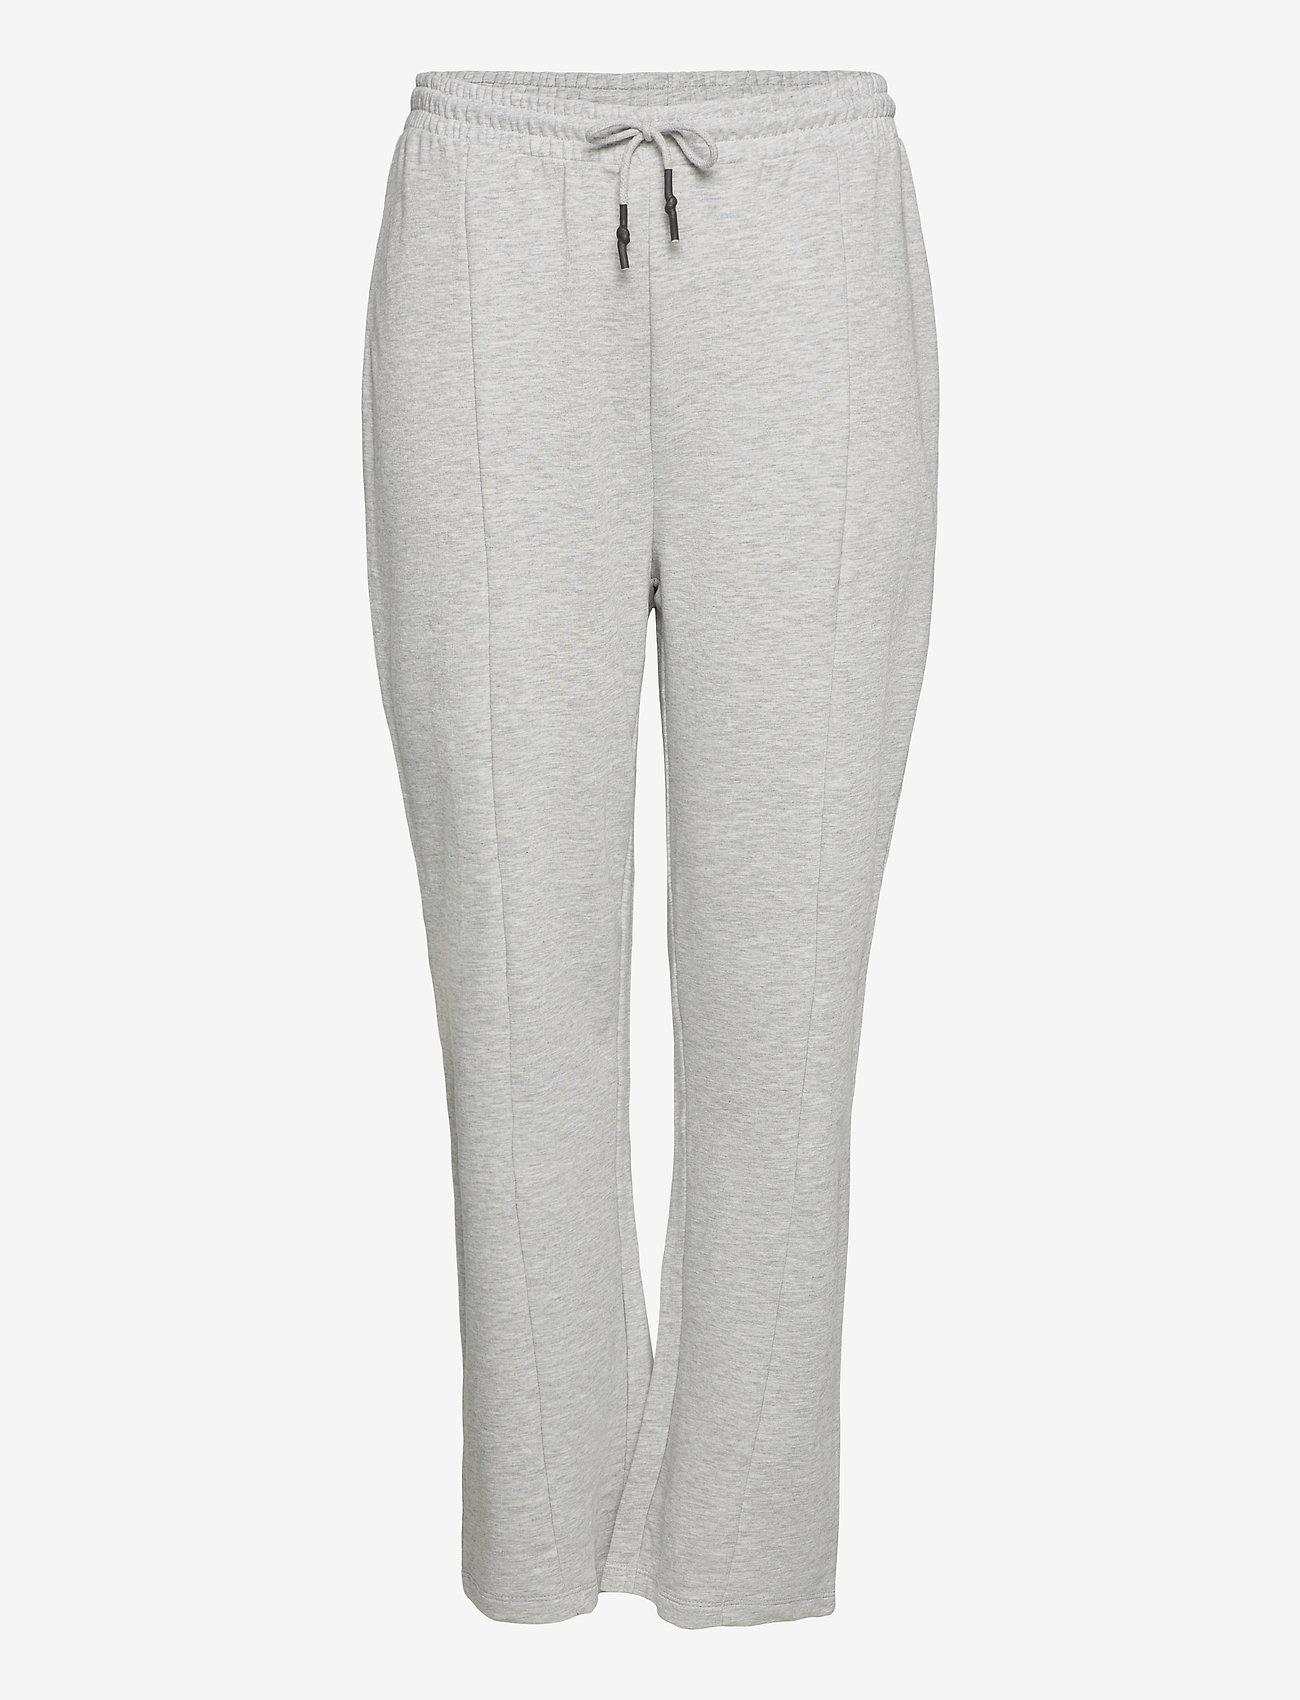 ONLY Carmakoma - CARDELLI LIFE PANTS - sweatpants - light grey melange - 0